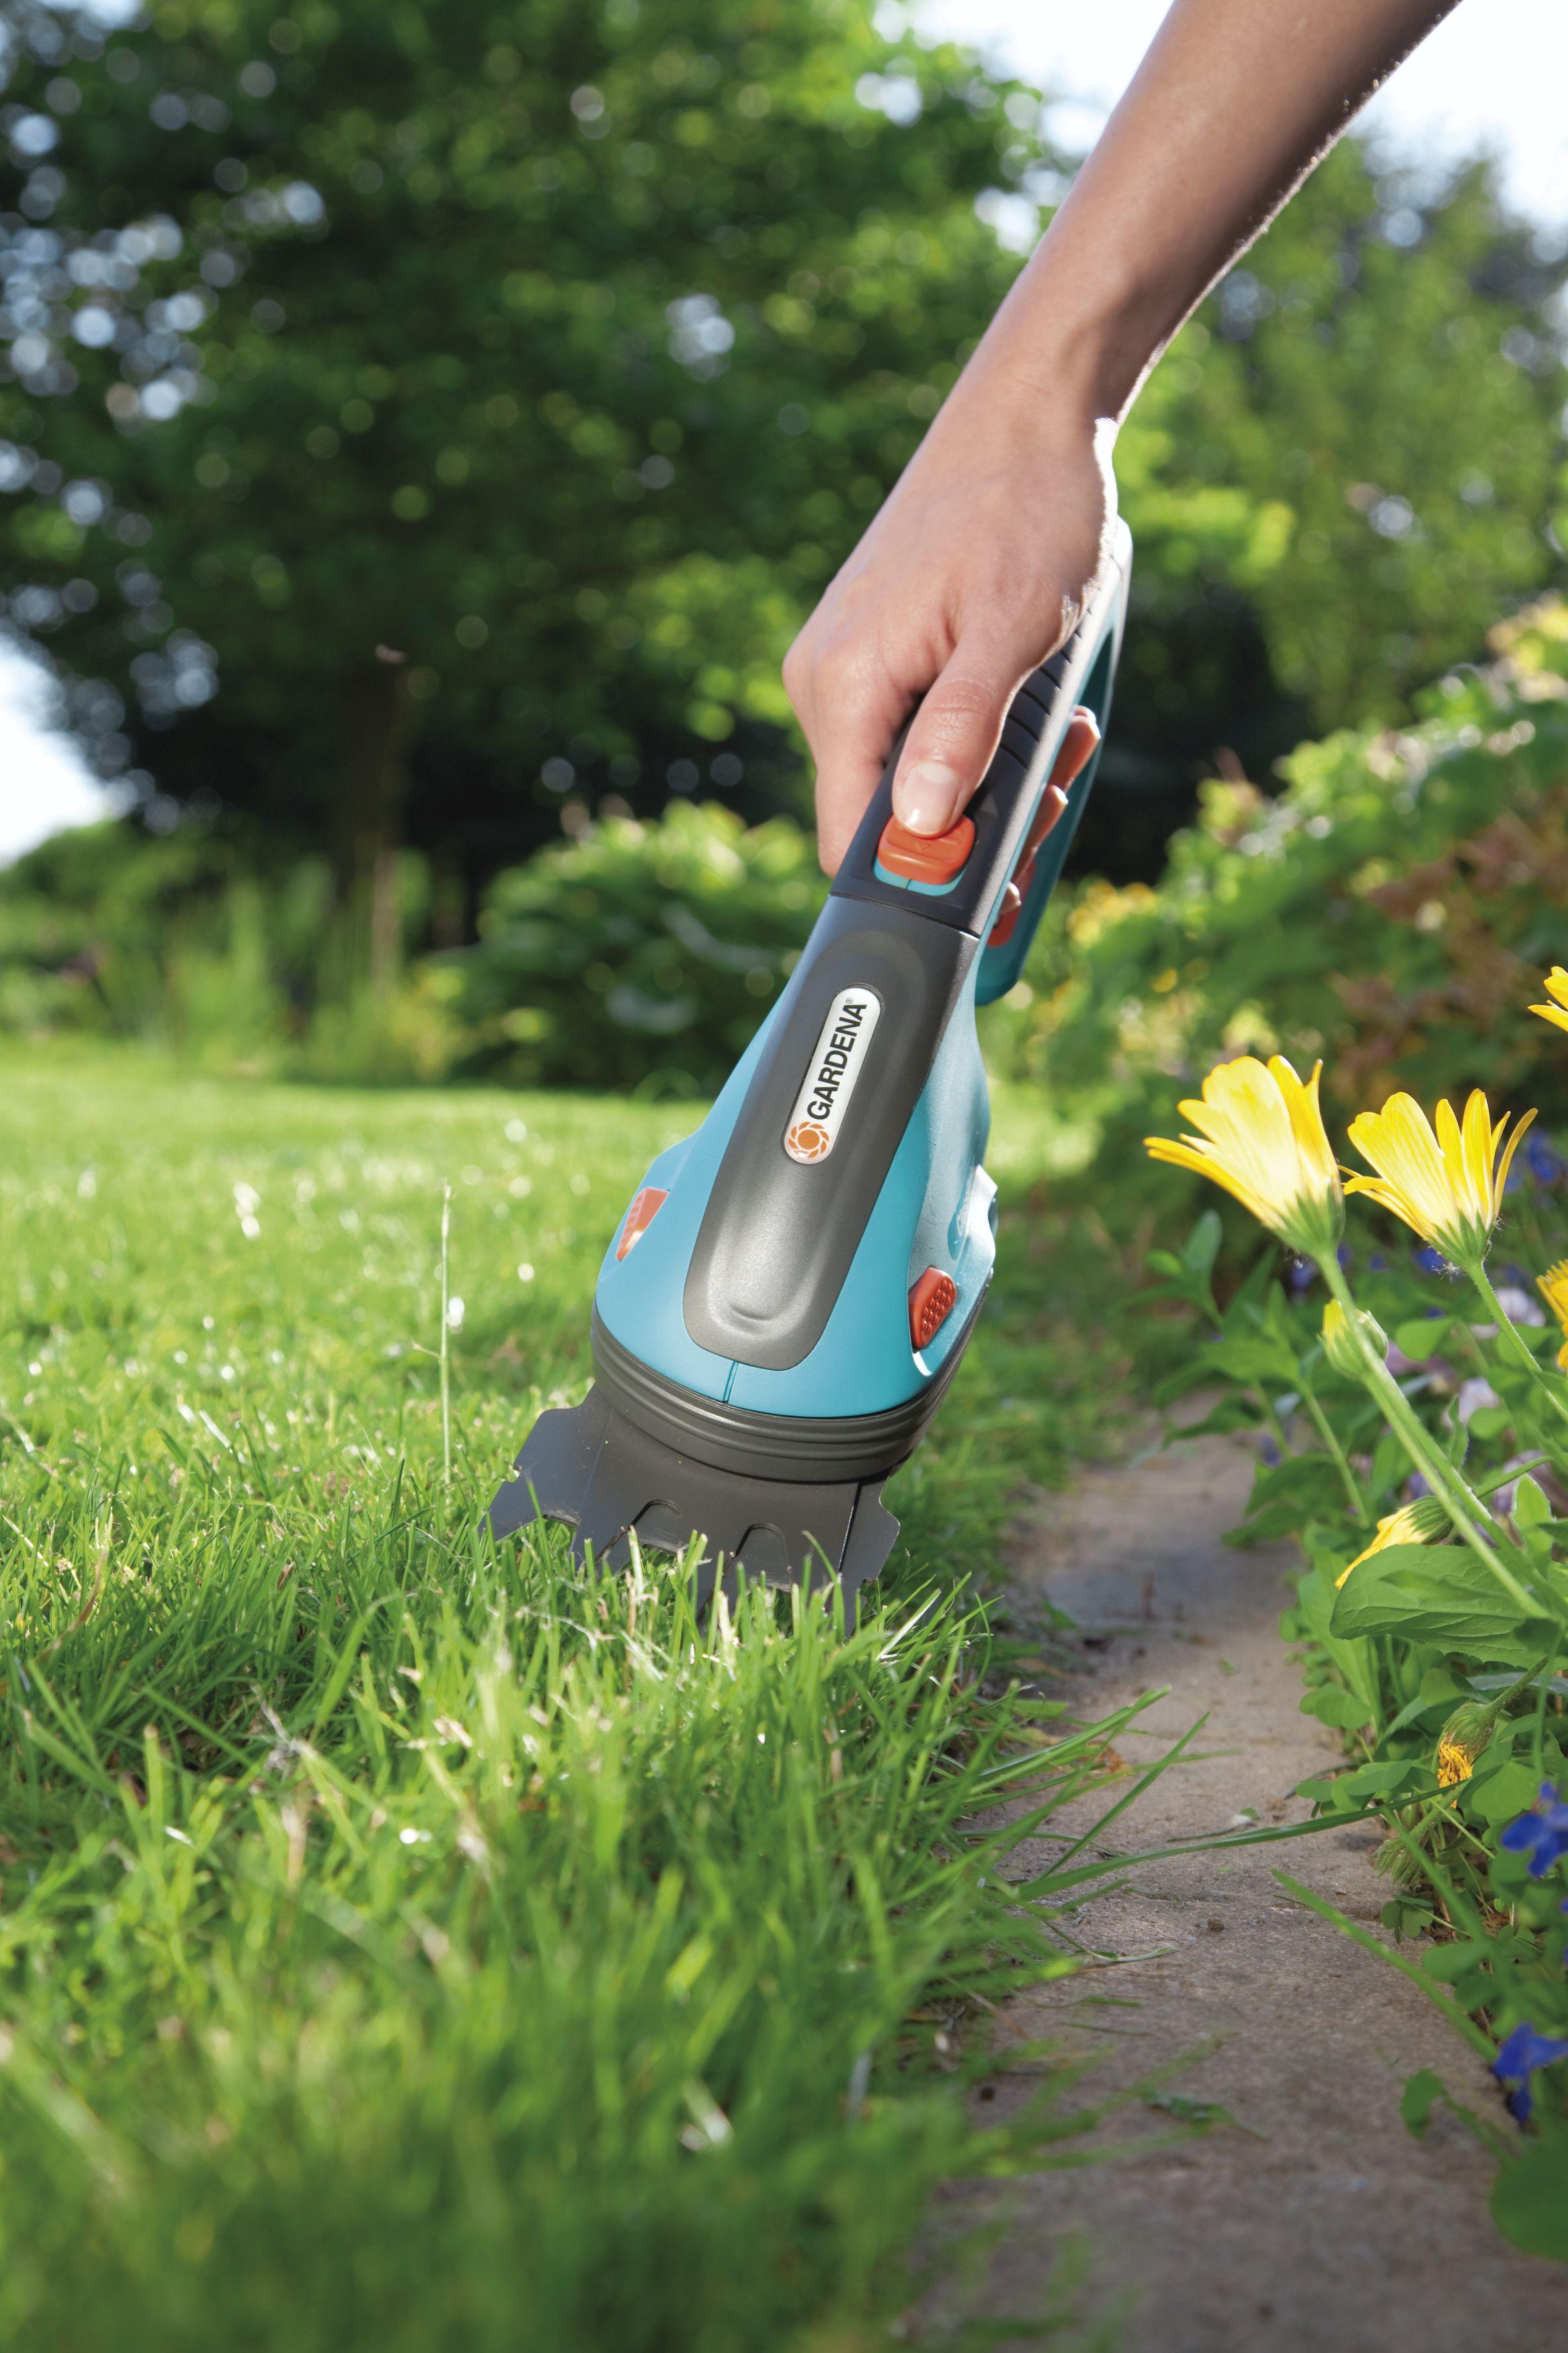 Как выбрать электроножницы для травы